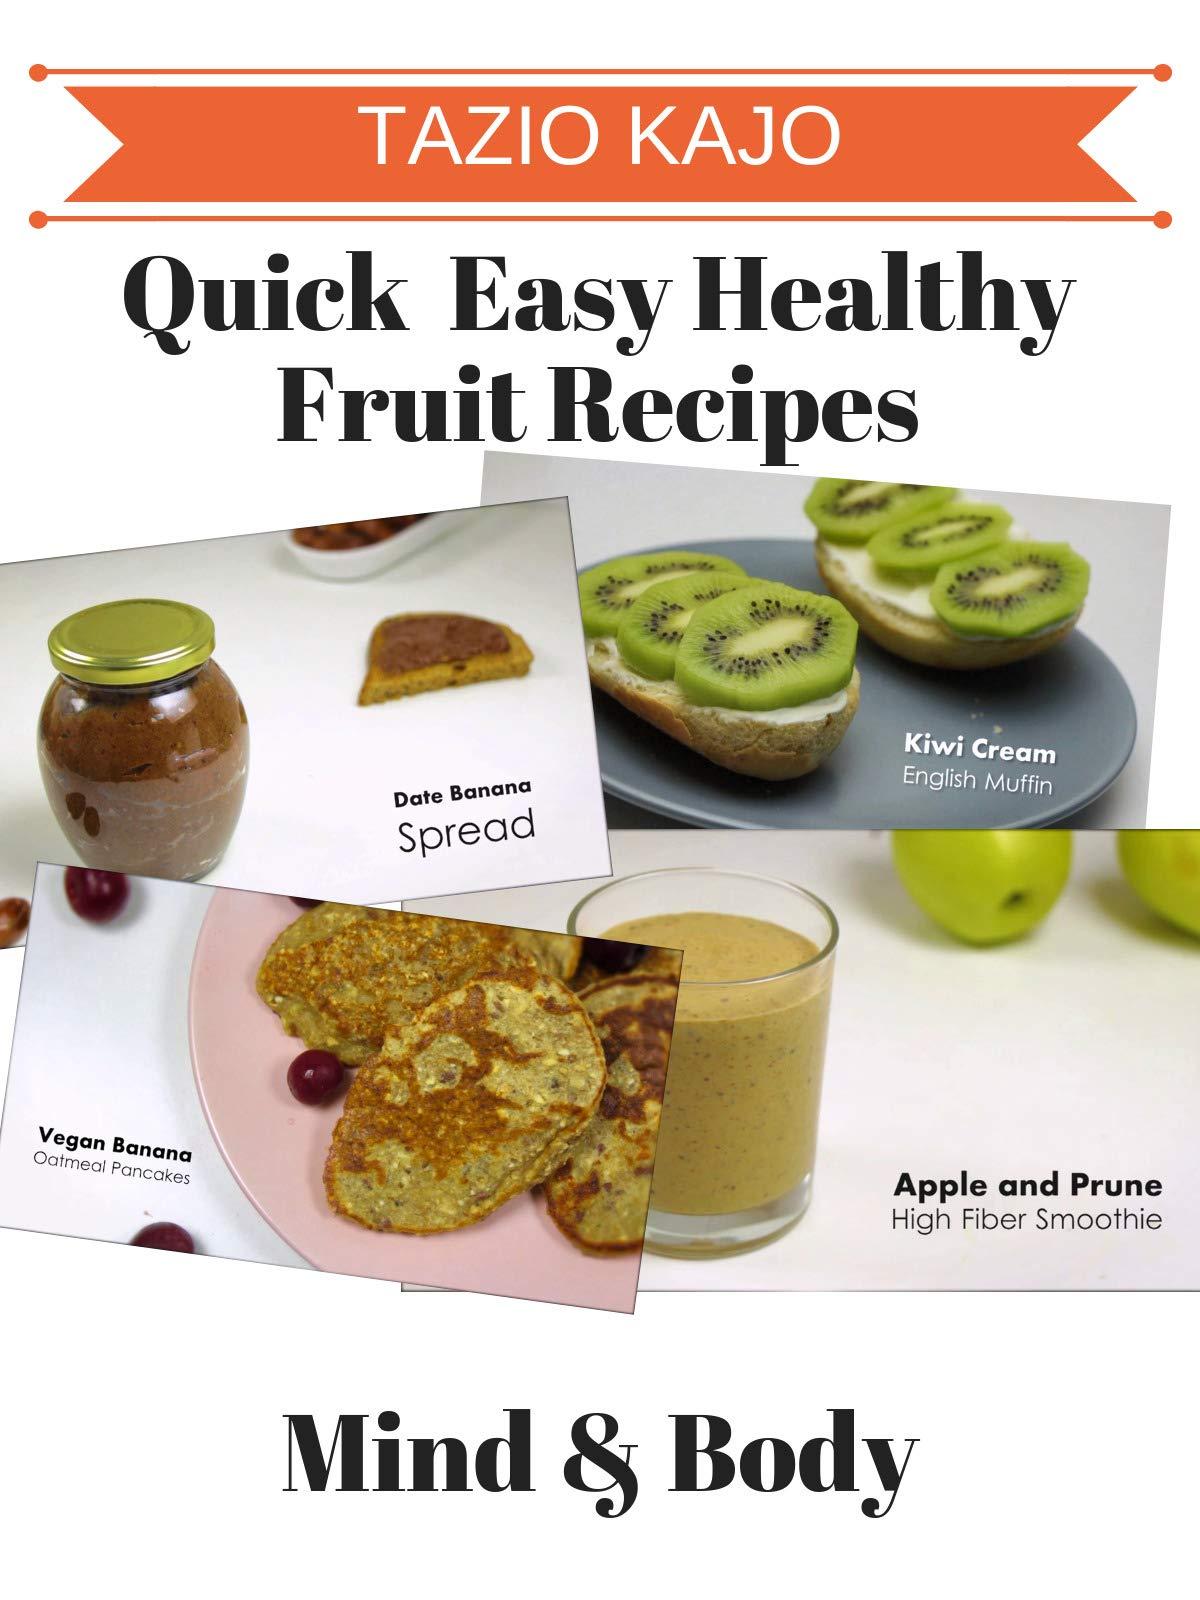 Quick & Easy Healthy Fruit Recipes